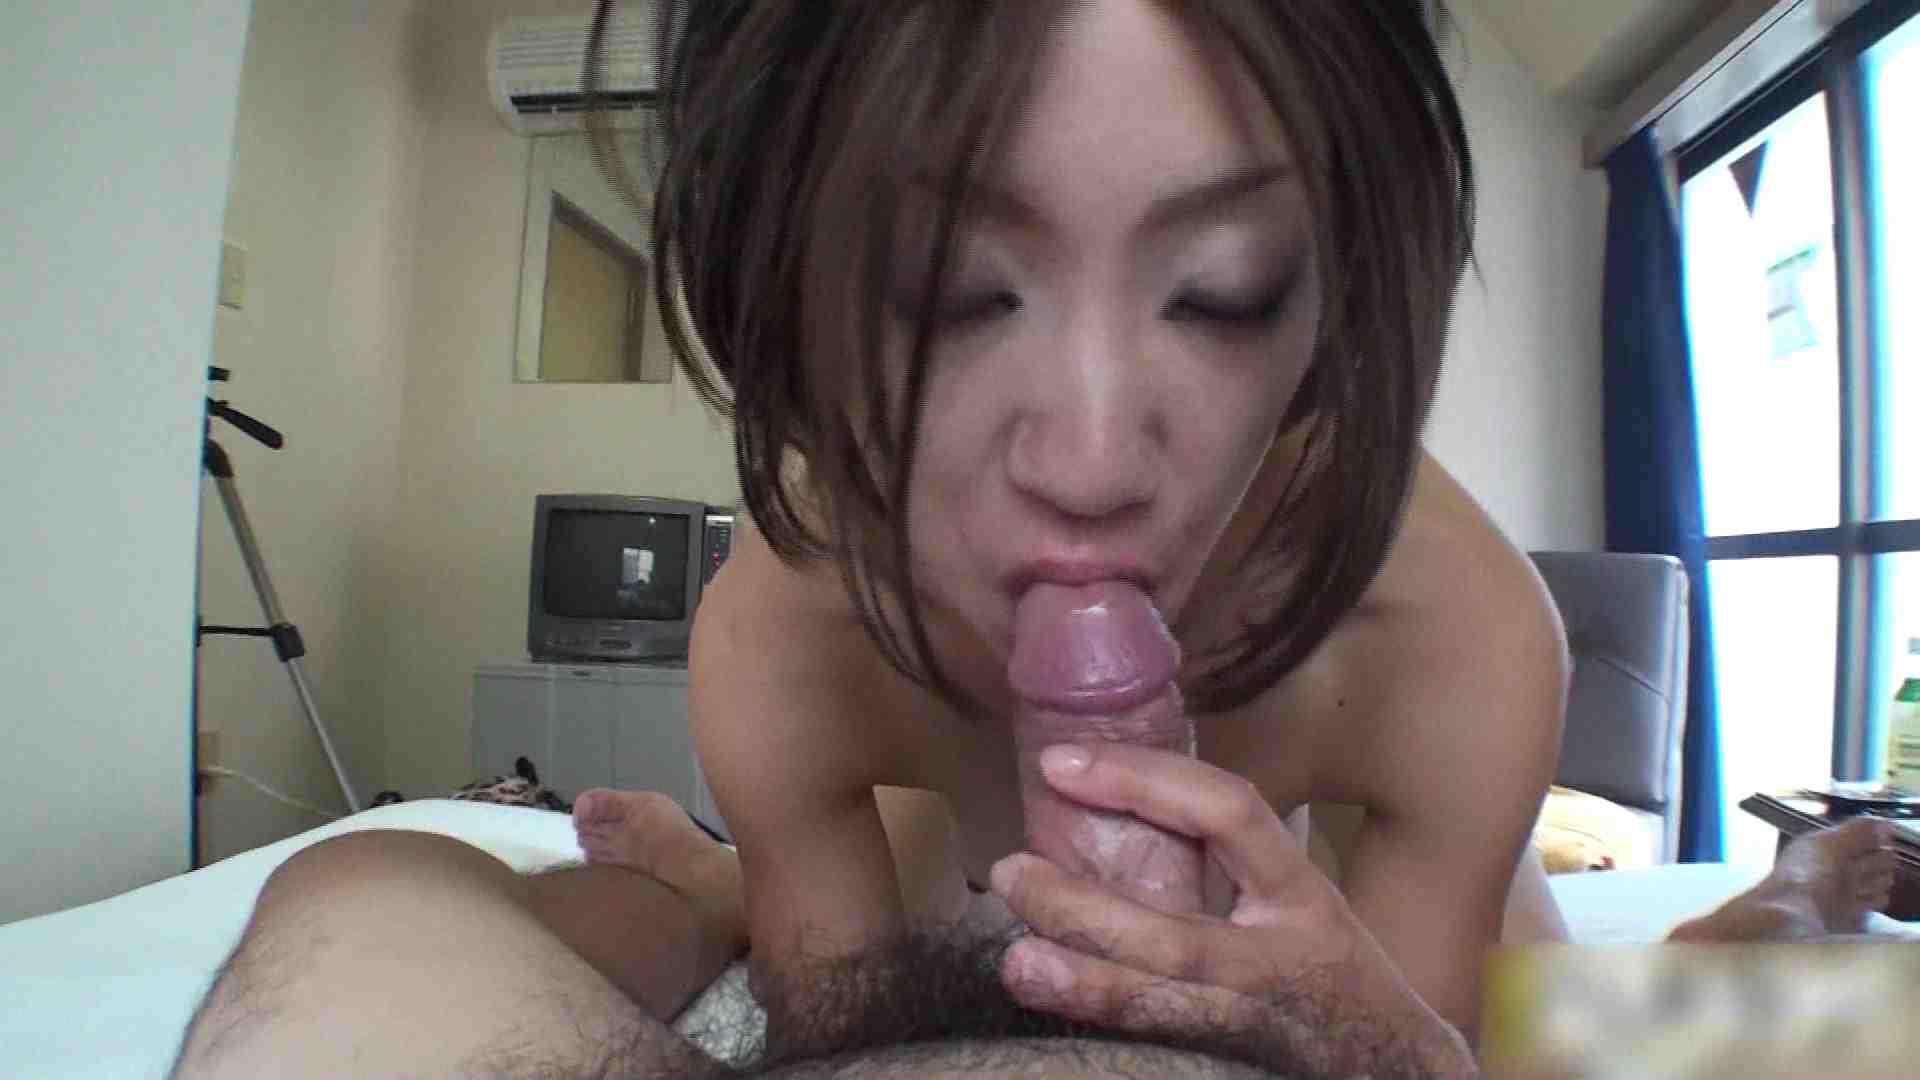 S級厳選美女ビッチガールVol.46 ギャルのエロ動画 オマンコ動画キャプチャ 60画像 33